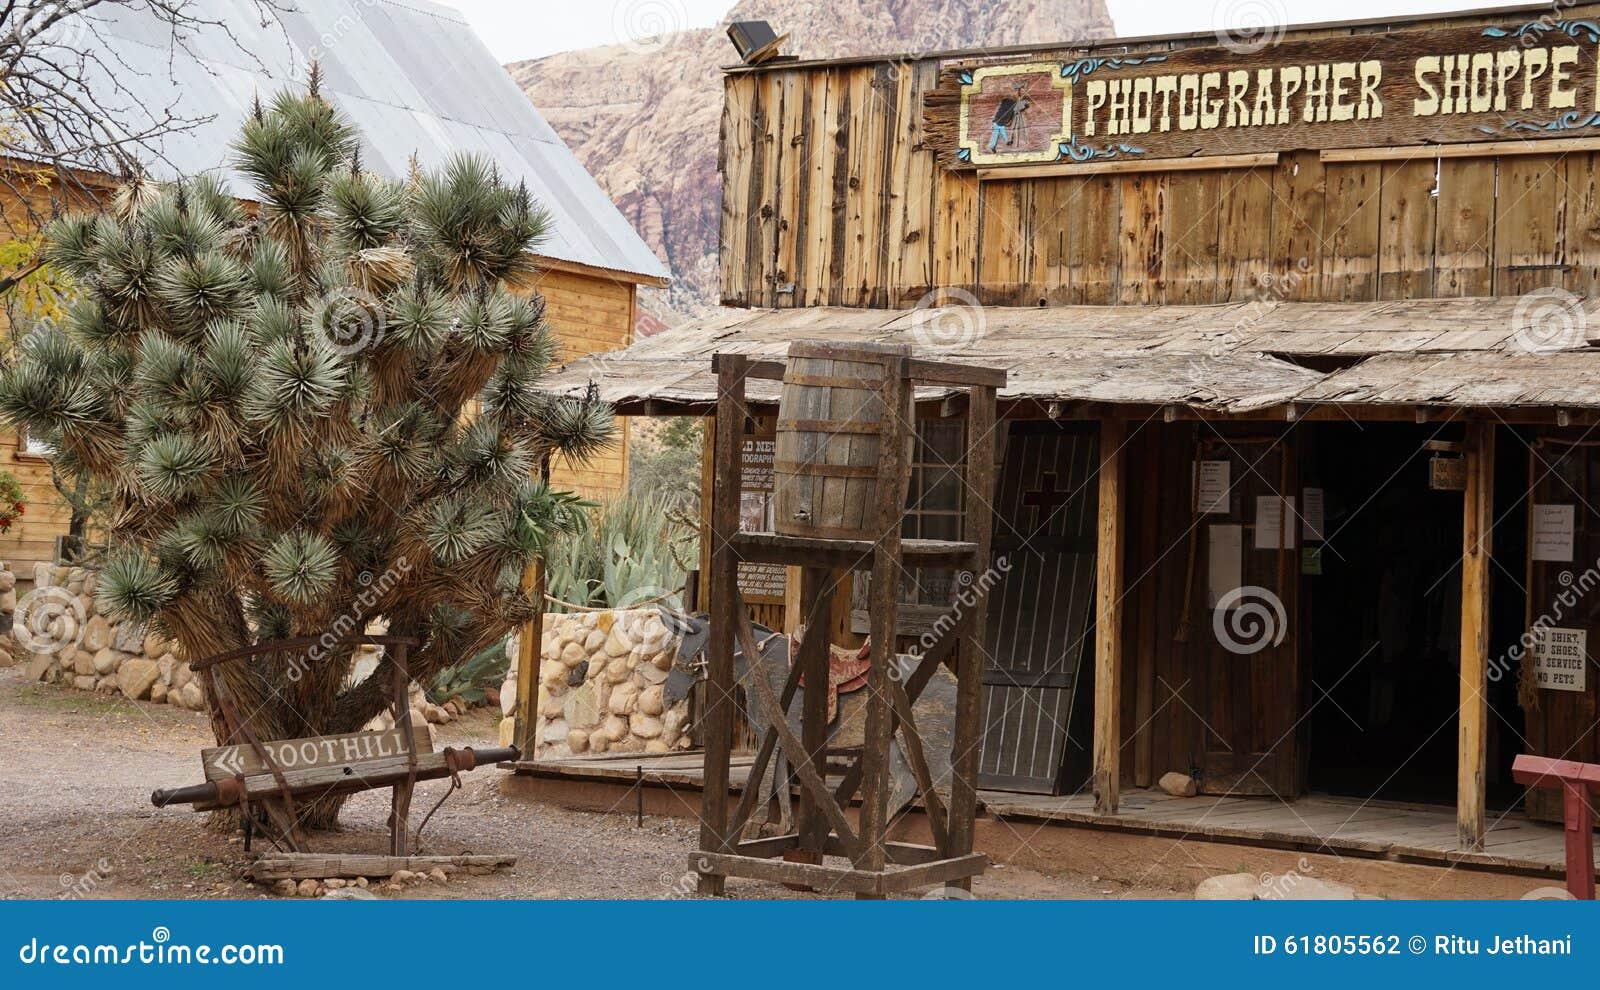 Awe Inspiring Bonnie Springs Ranch In Las Vegas Nevada Editorial Machost Co Dining Chair Design Ideas Machostcouk